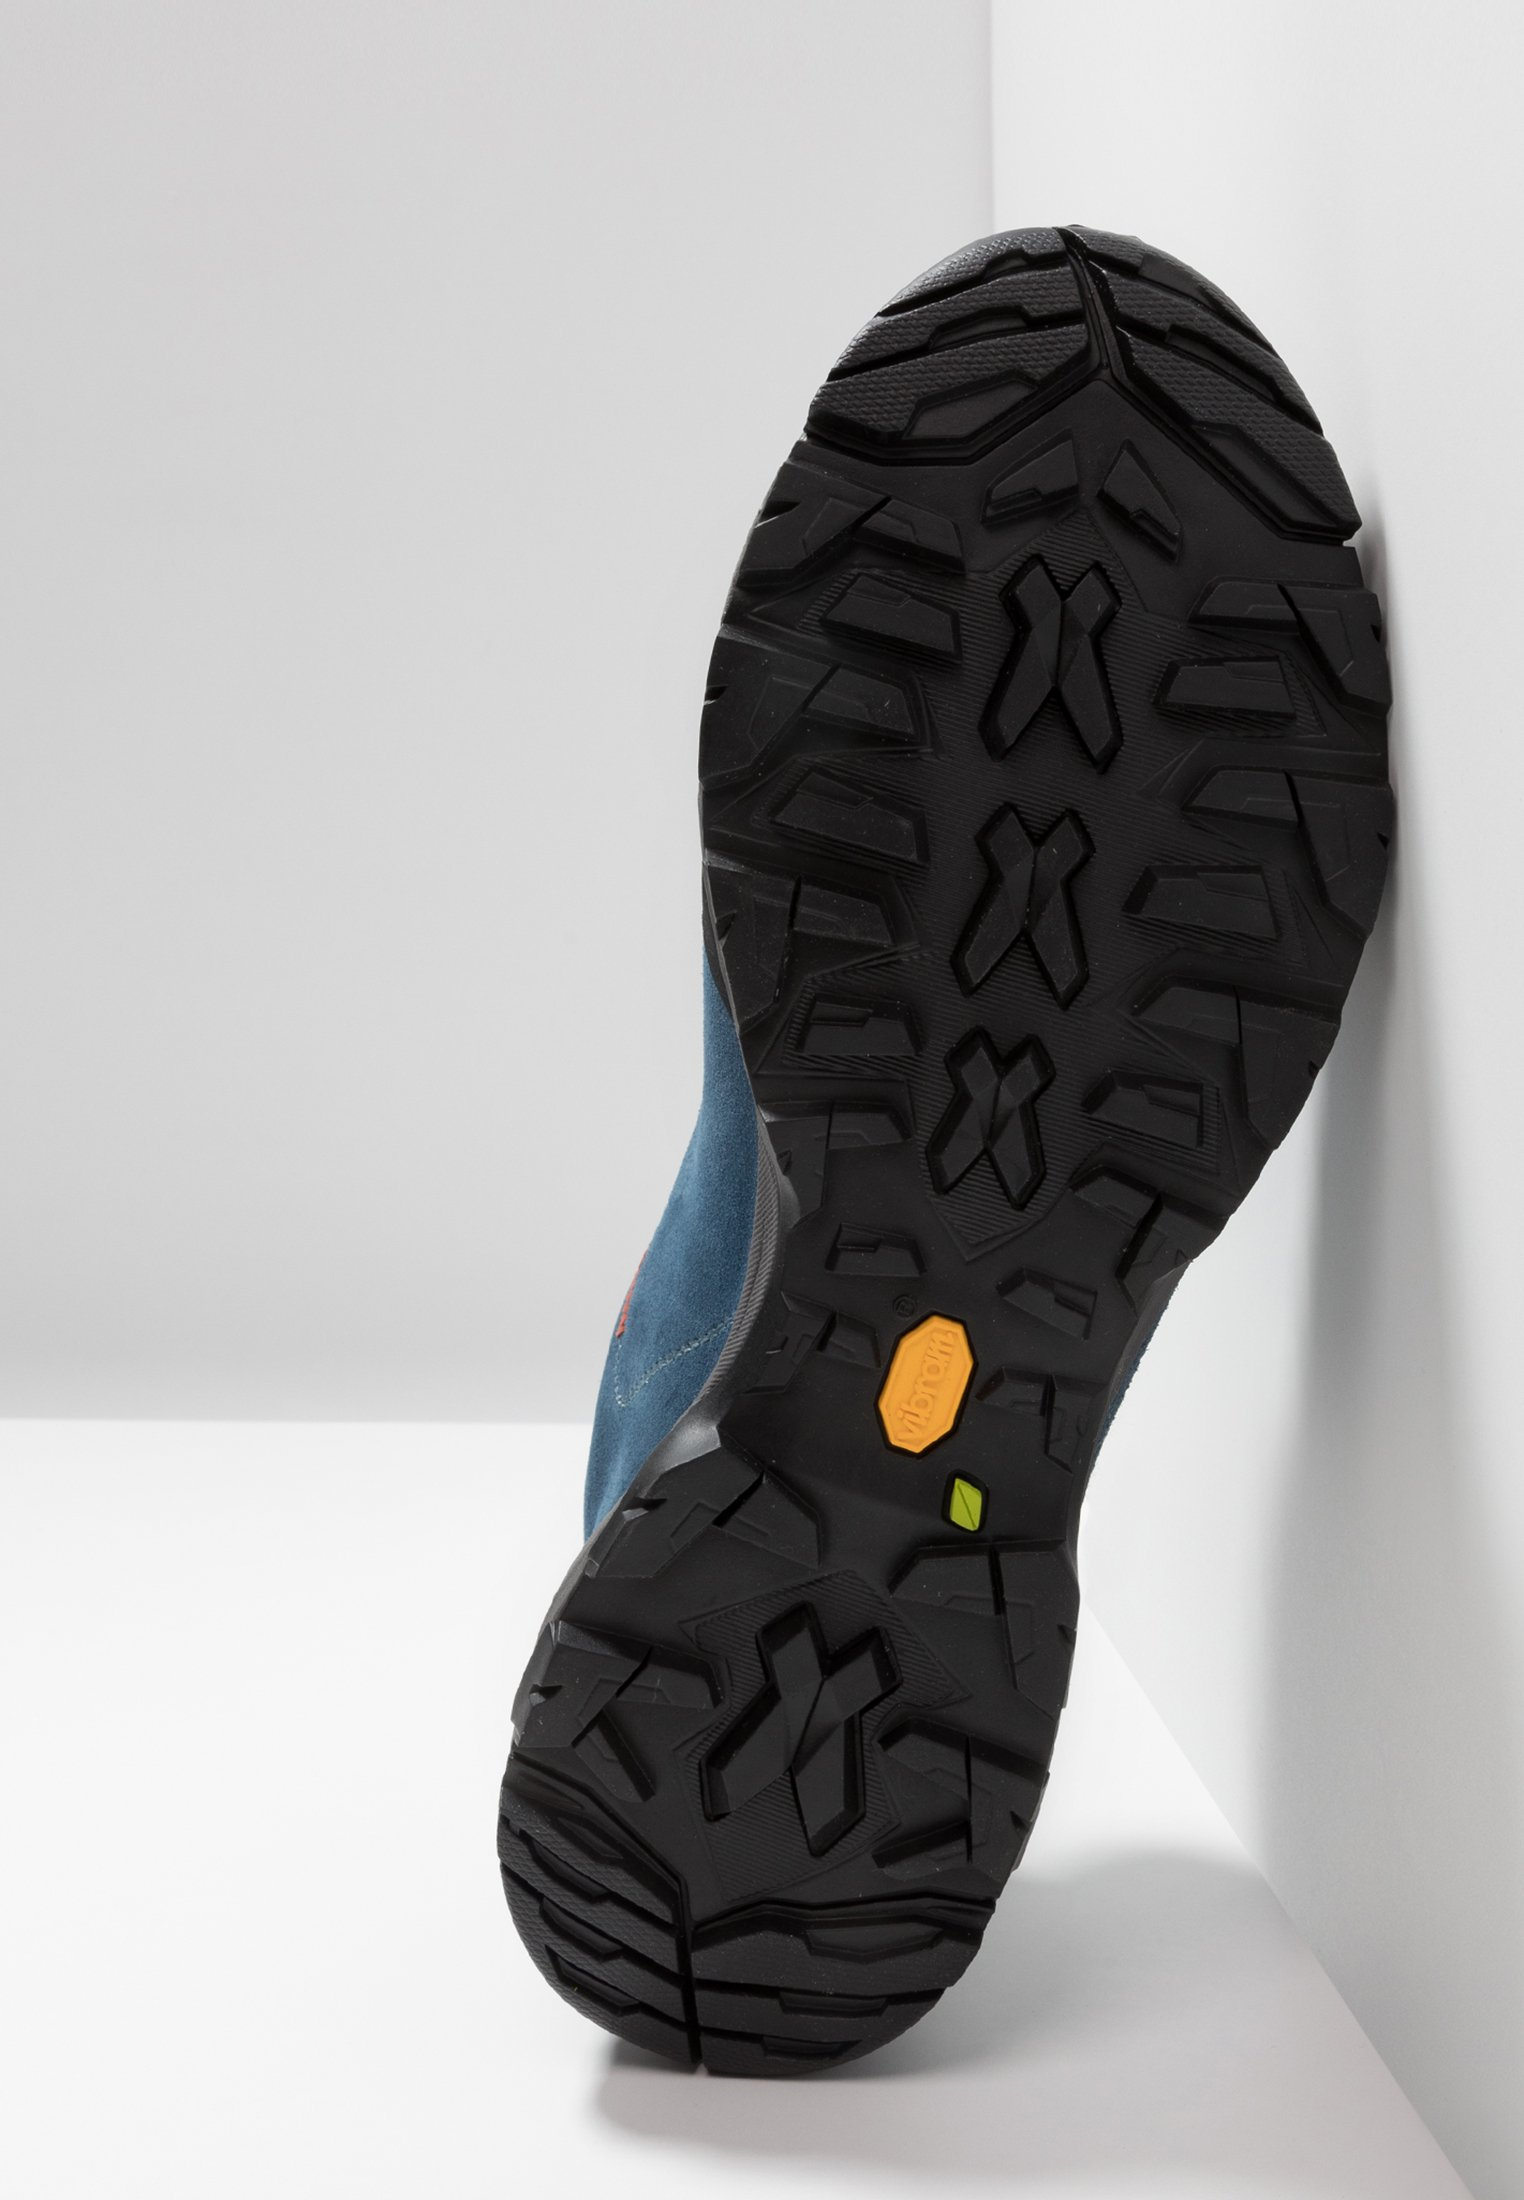 Comprar Calzado de hombre Scarpa MOJITO TRAIL GTX Zapatillas de trail running ocean EAgLVE